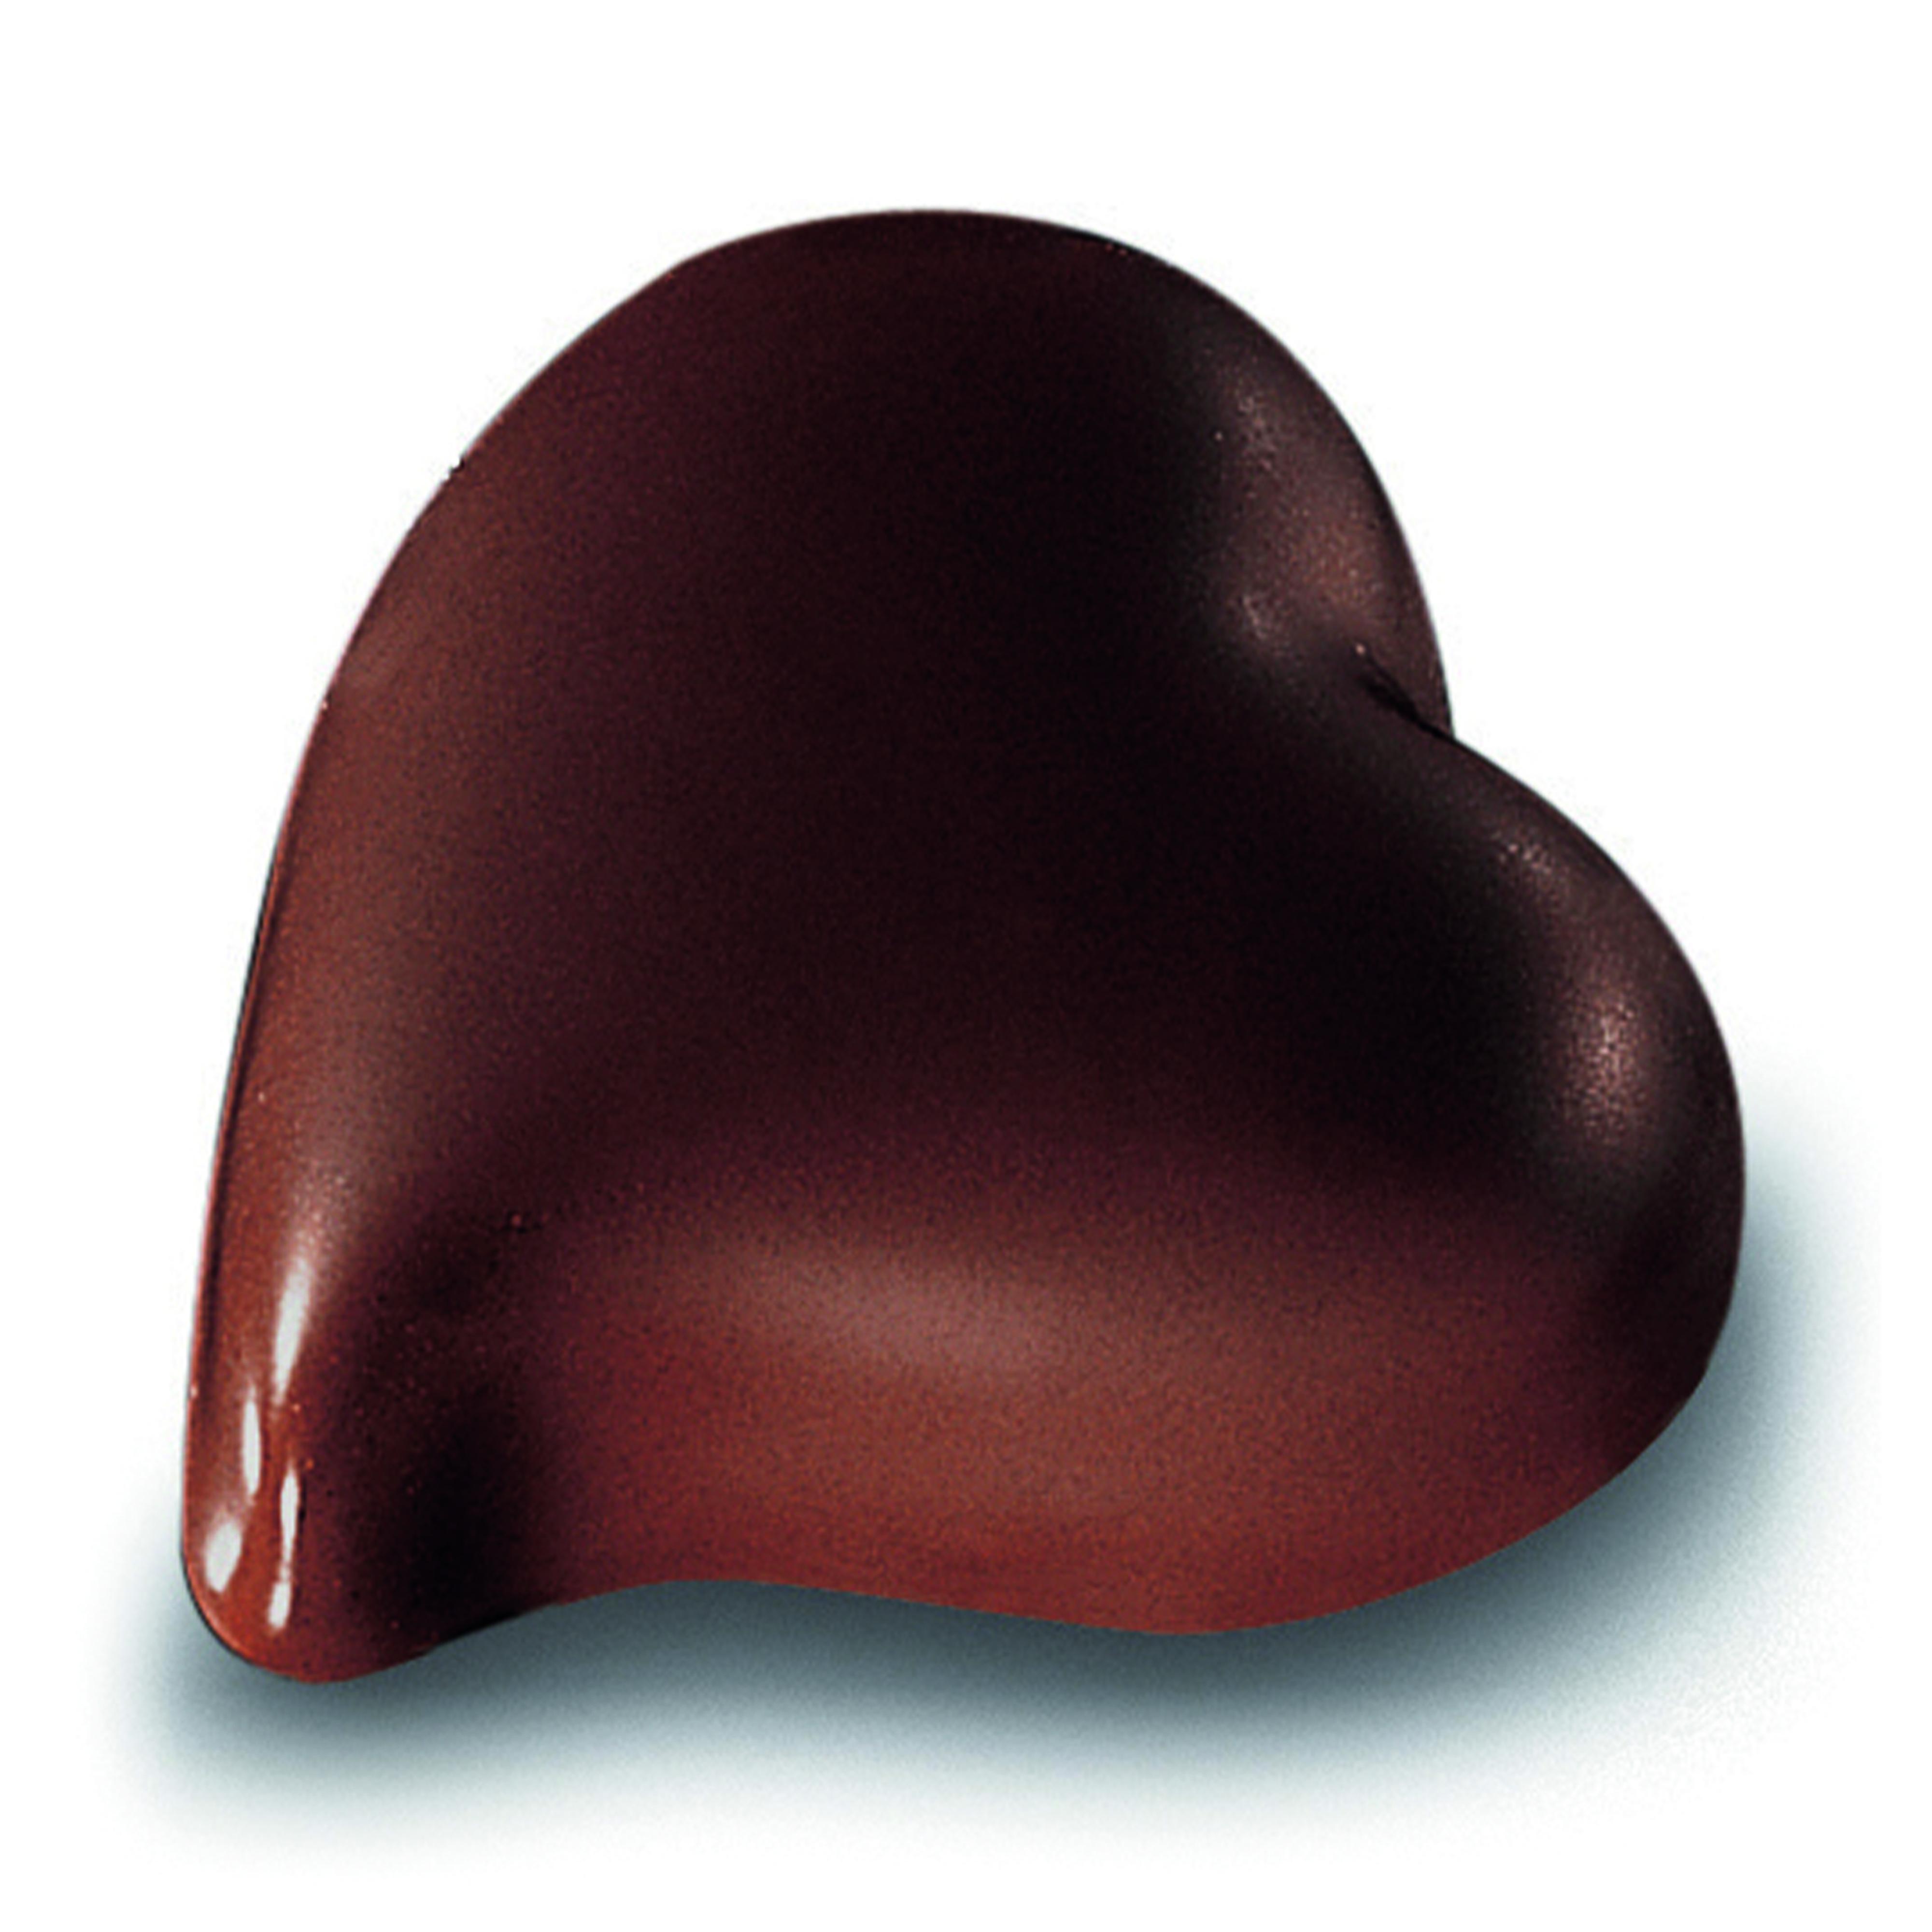 MANJARI Heart